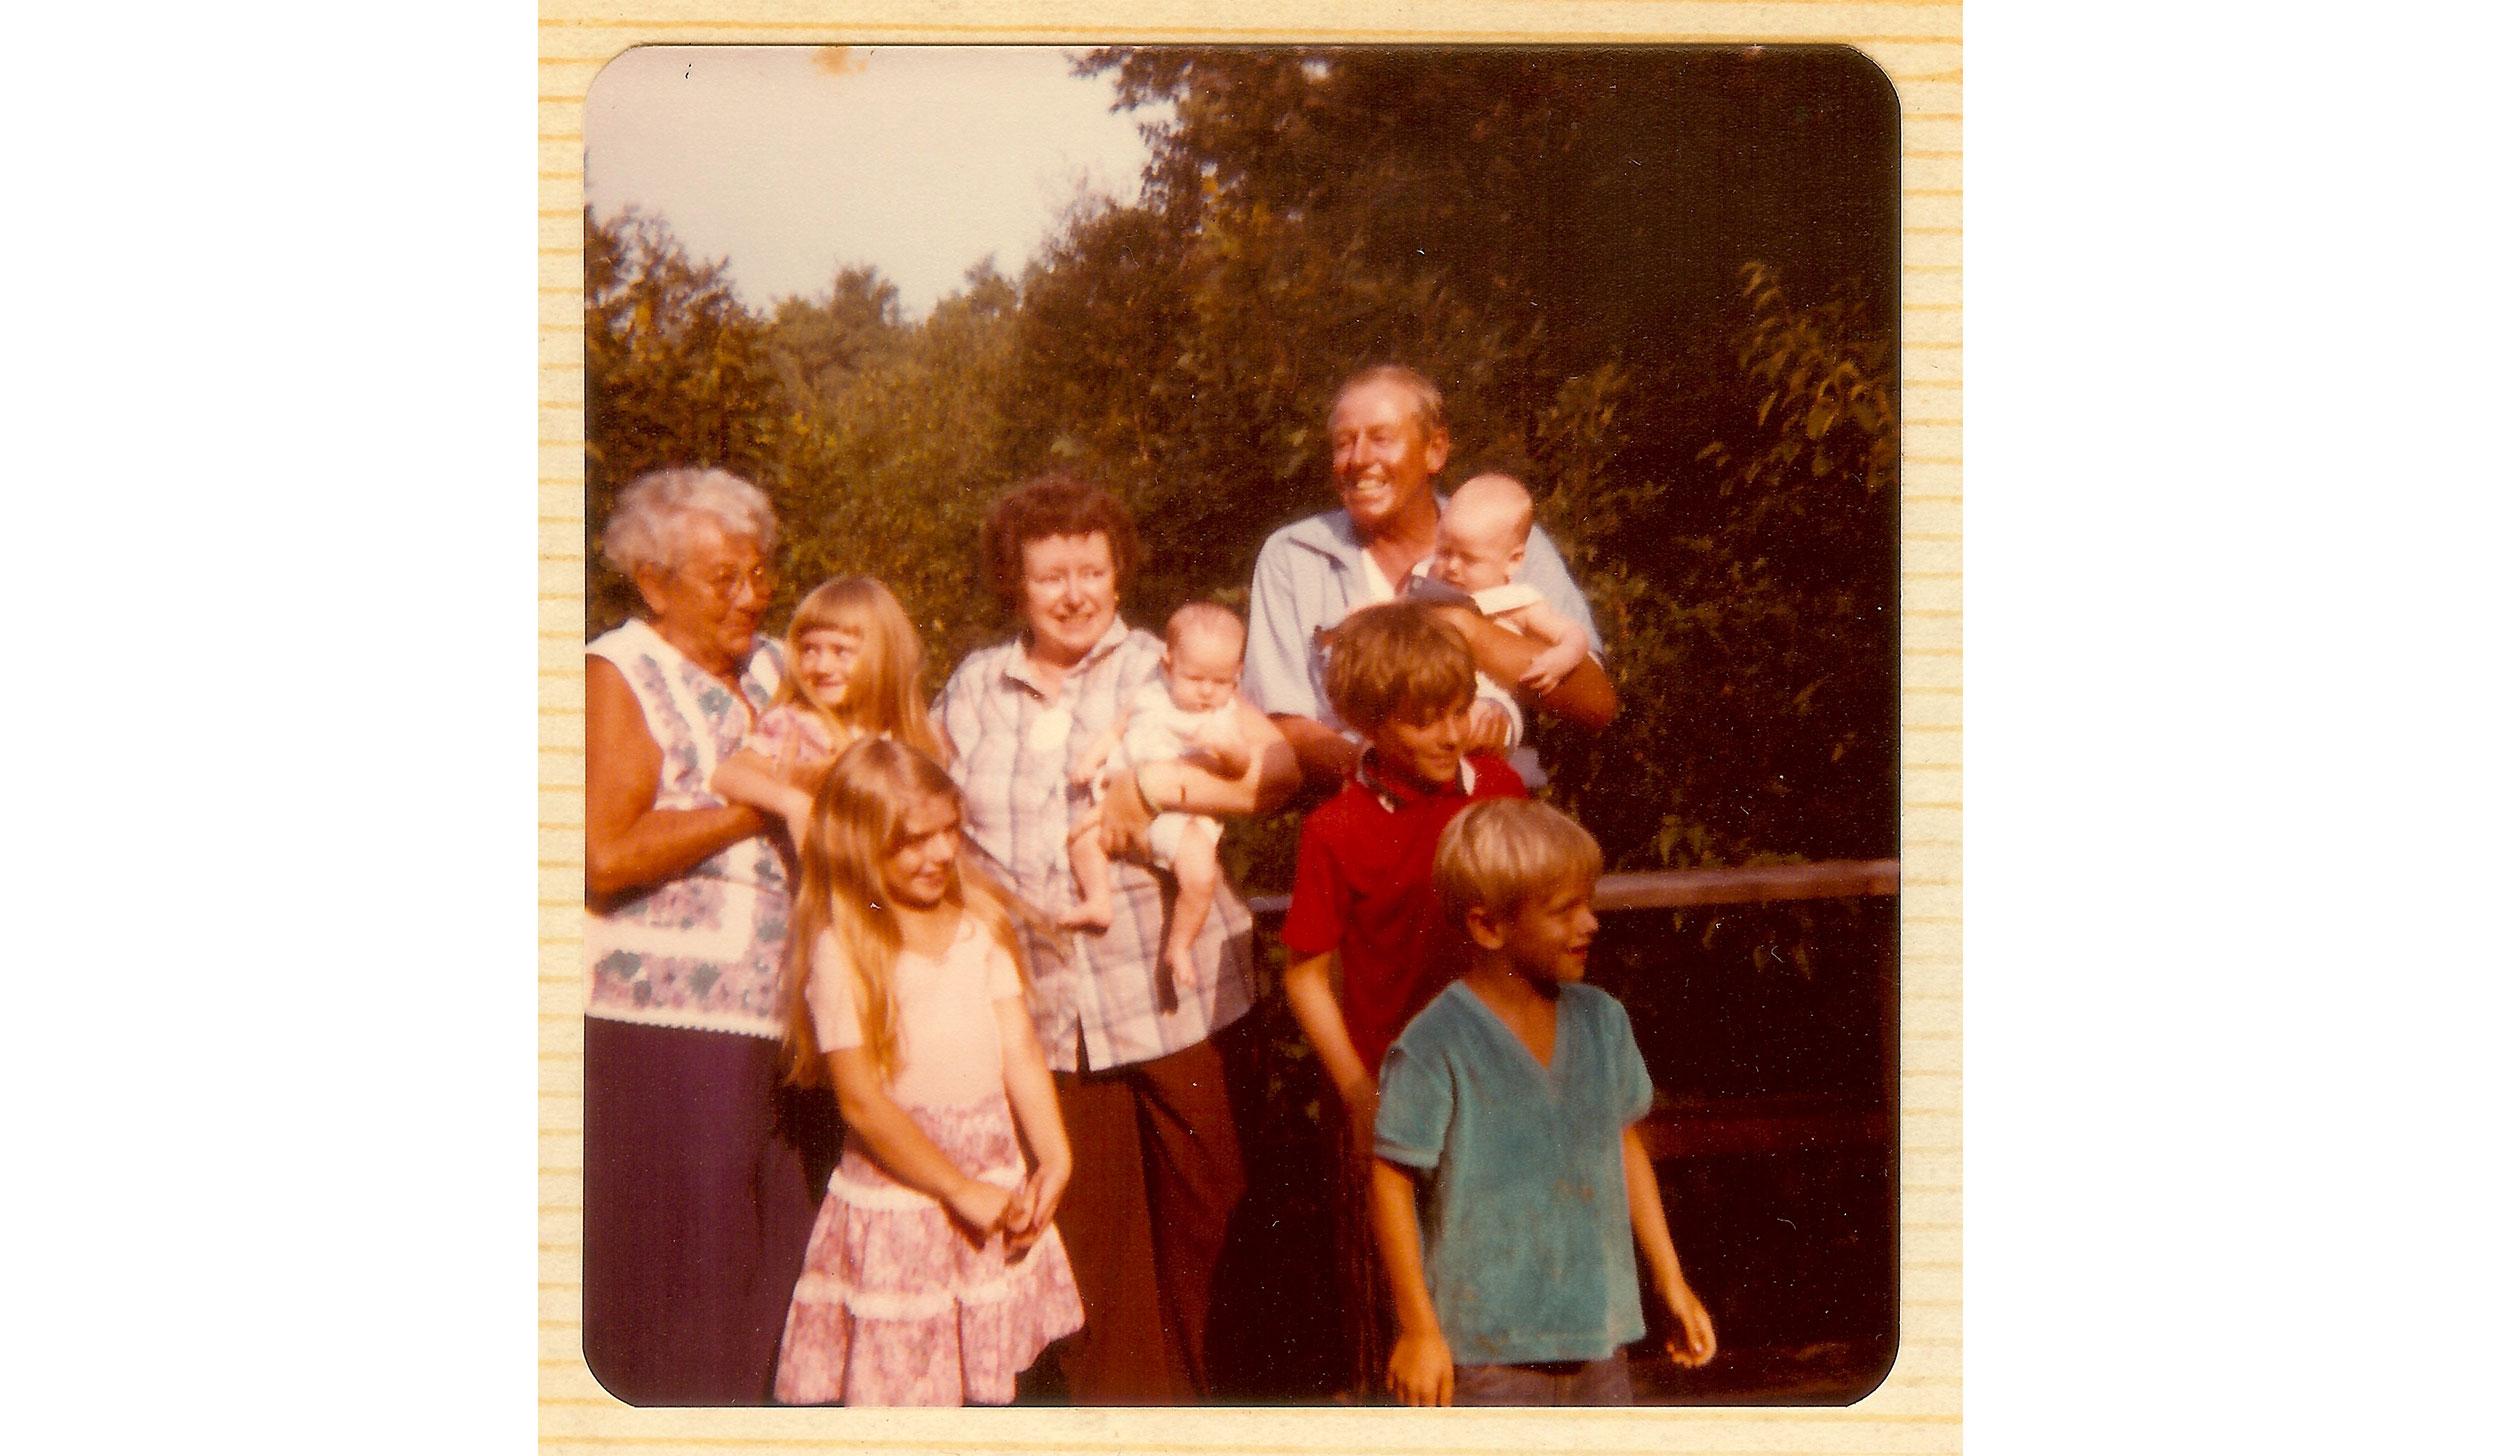 buzzbuckfamily.jpg